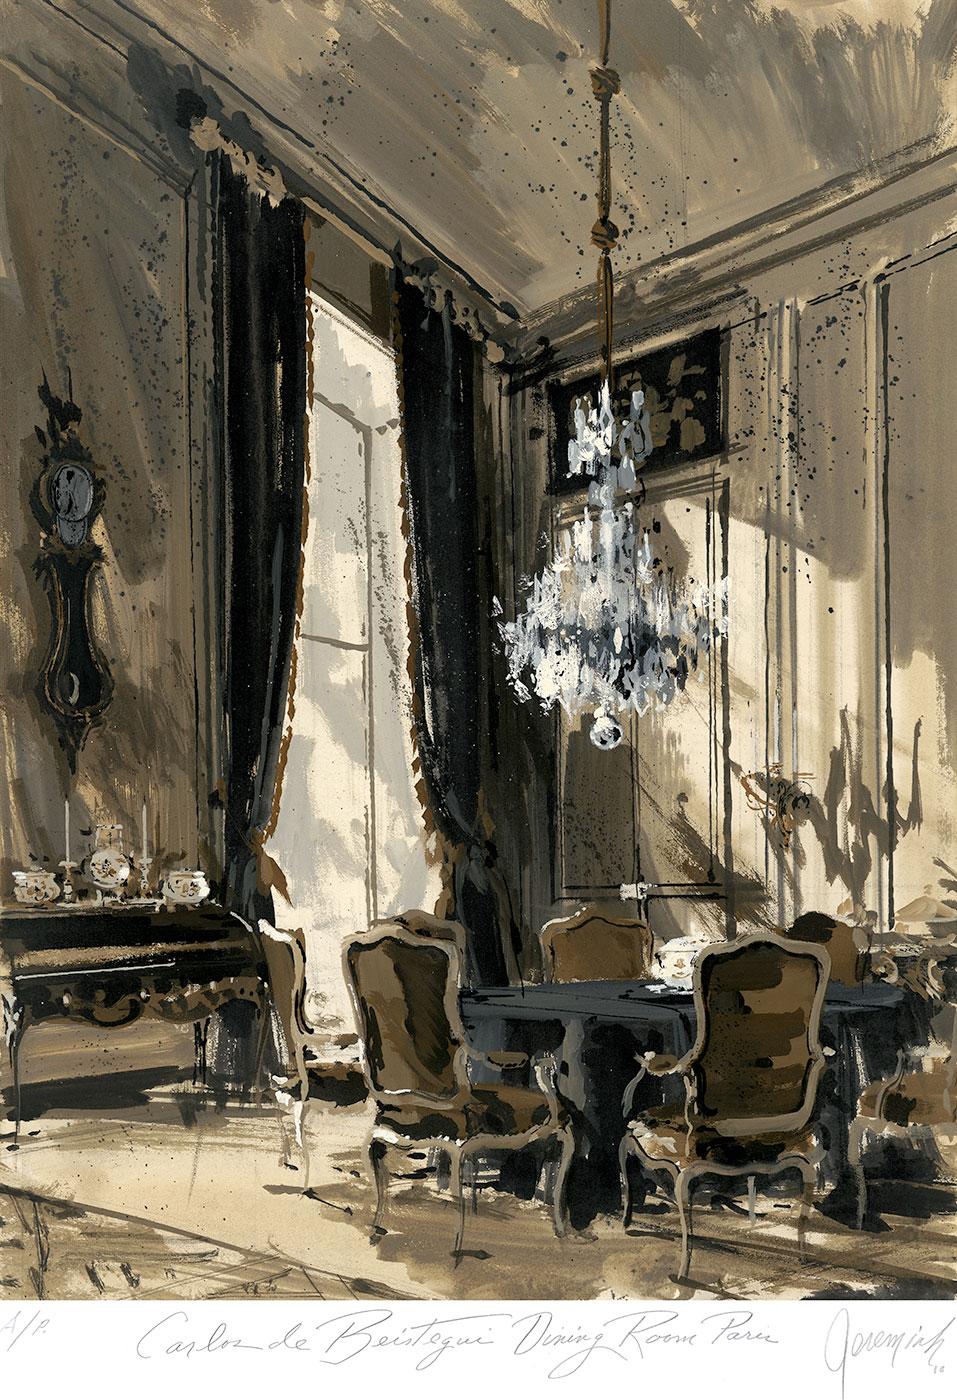 Carlos de Beistegui's dining room